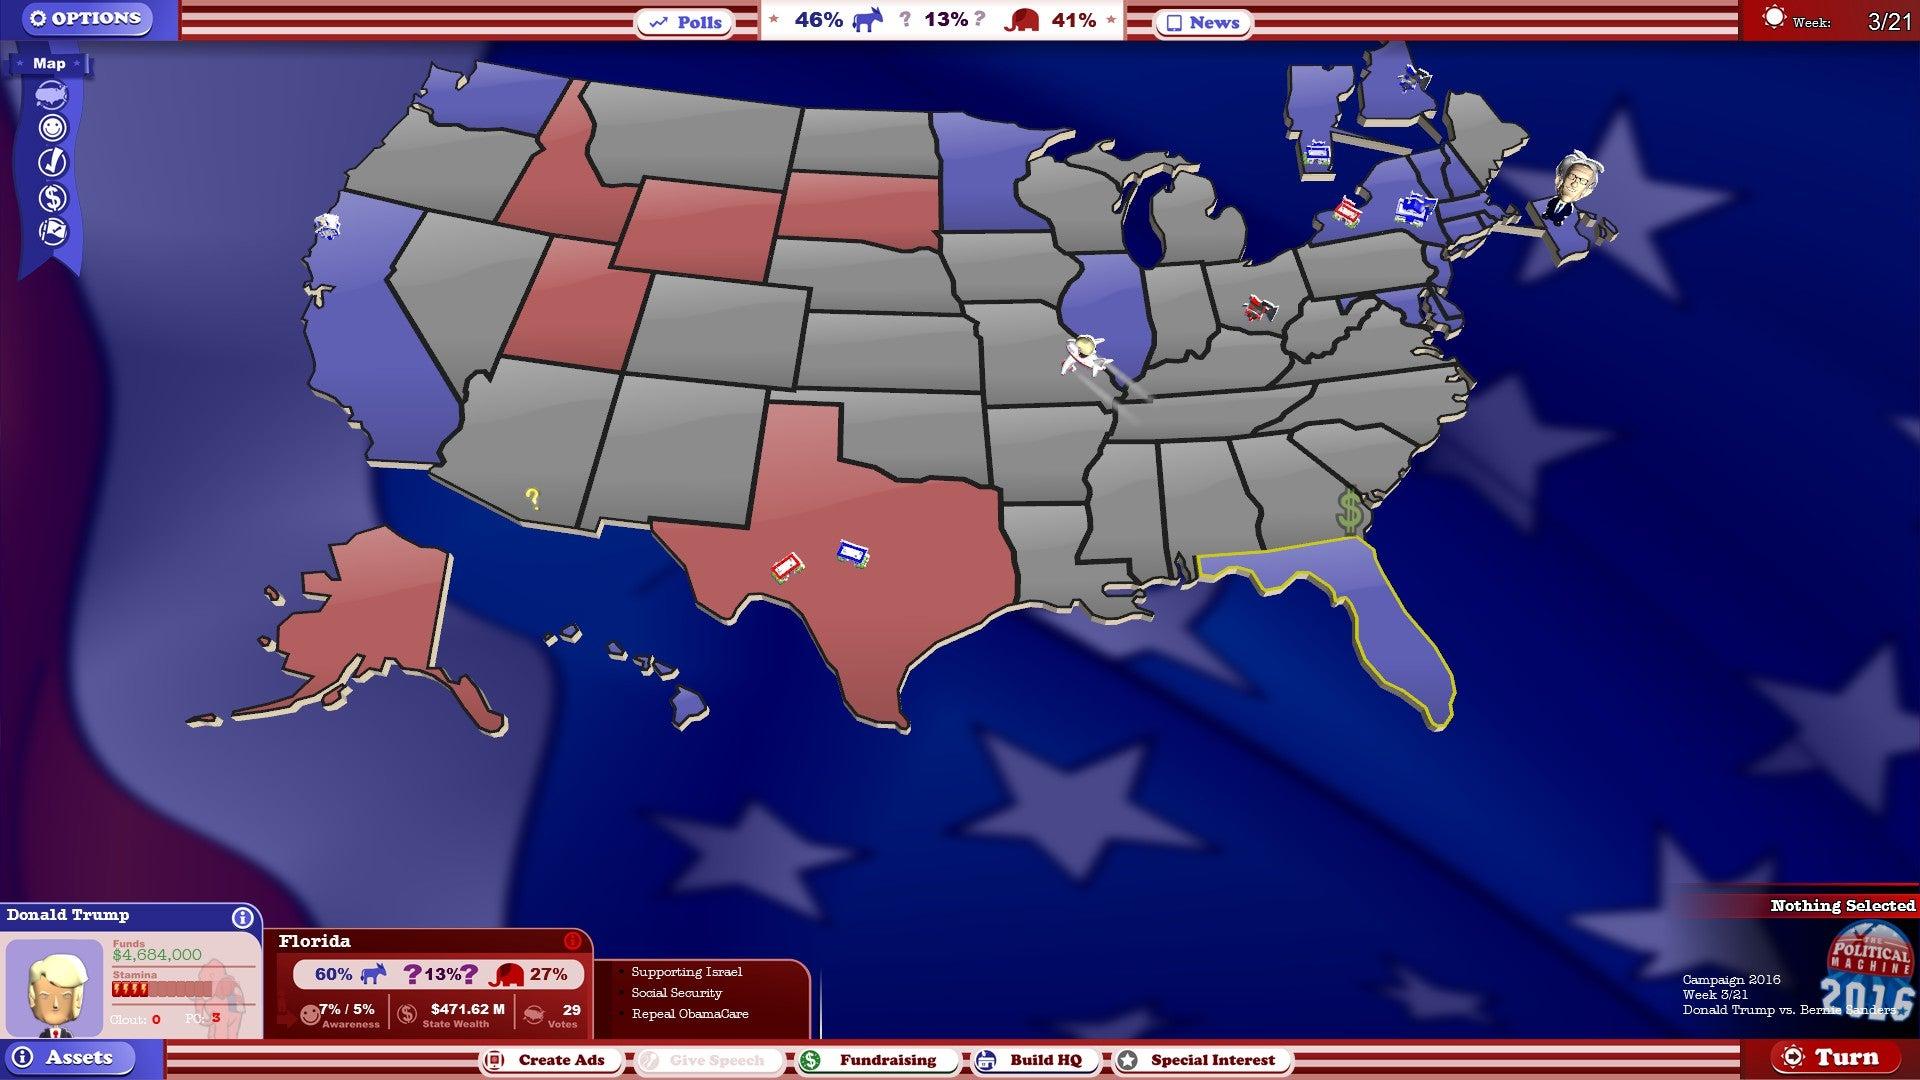 Play A Game About The 2016 US Election | Kotaku Australia